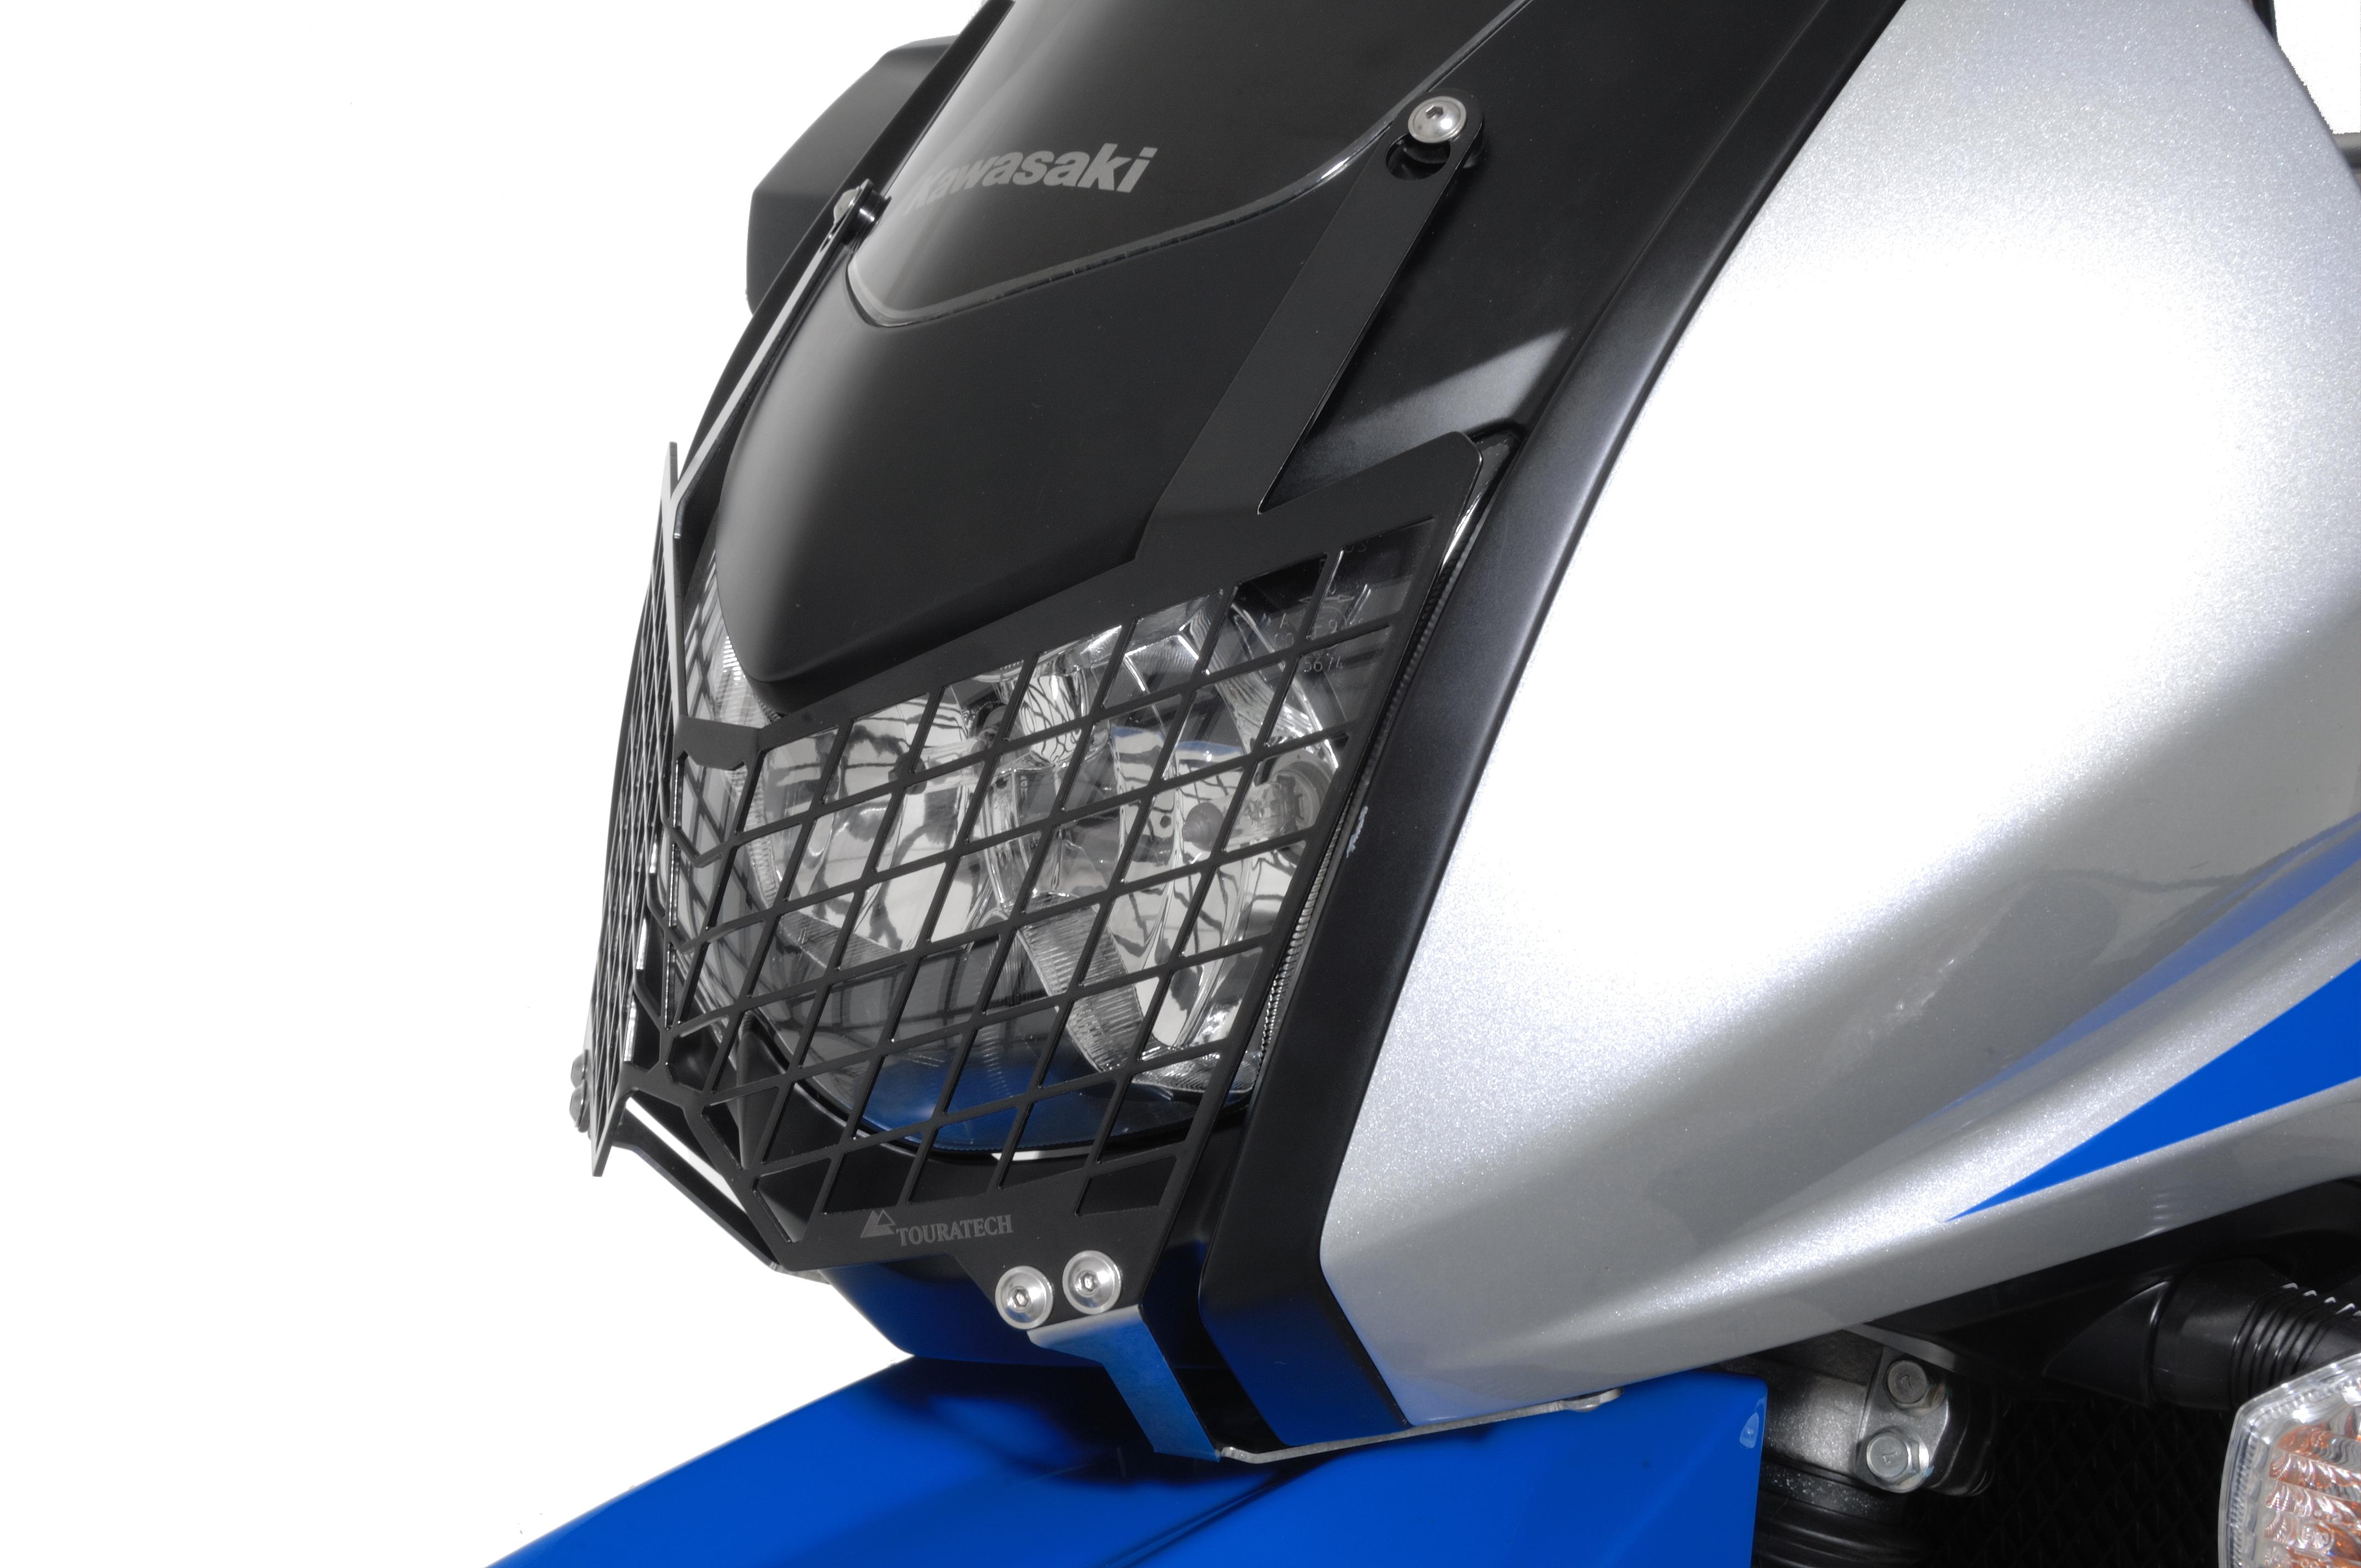 Touratech Accessories For Kawasaki Klr 650 Touratech Usa